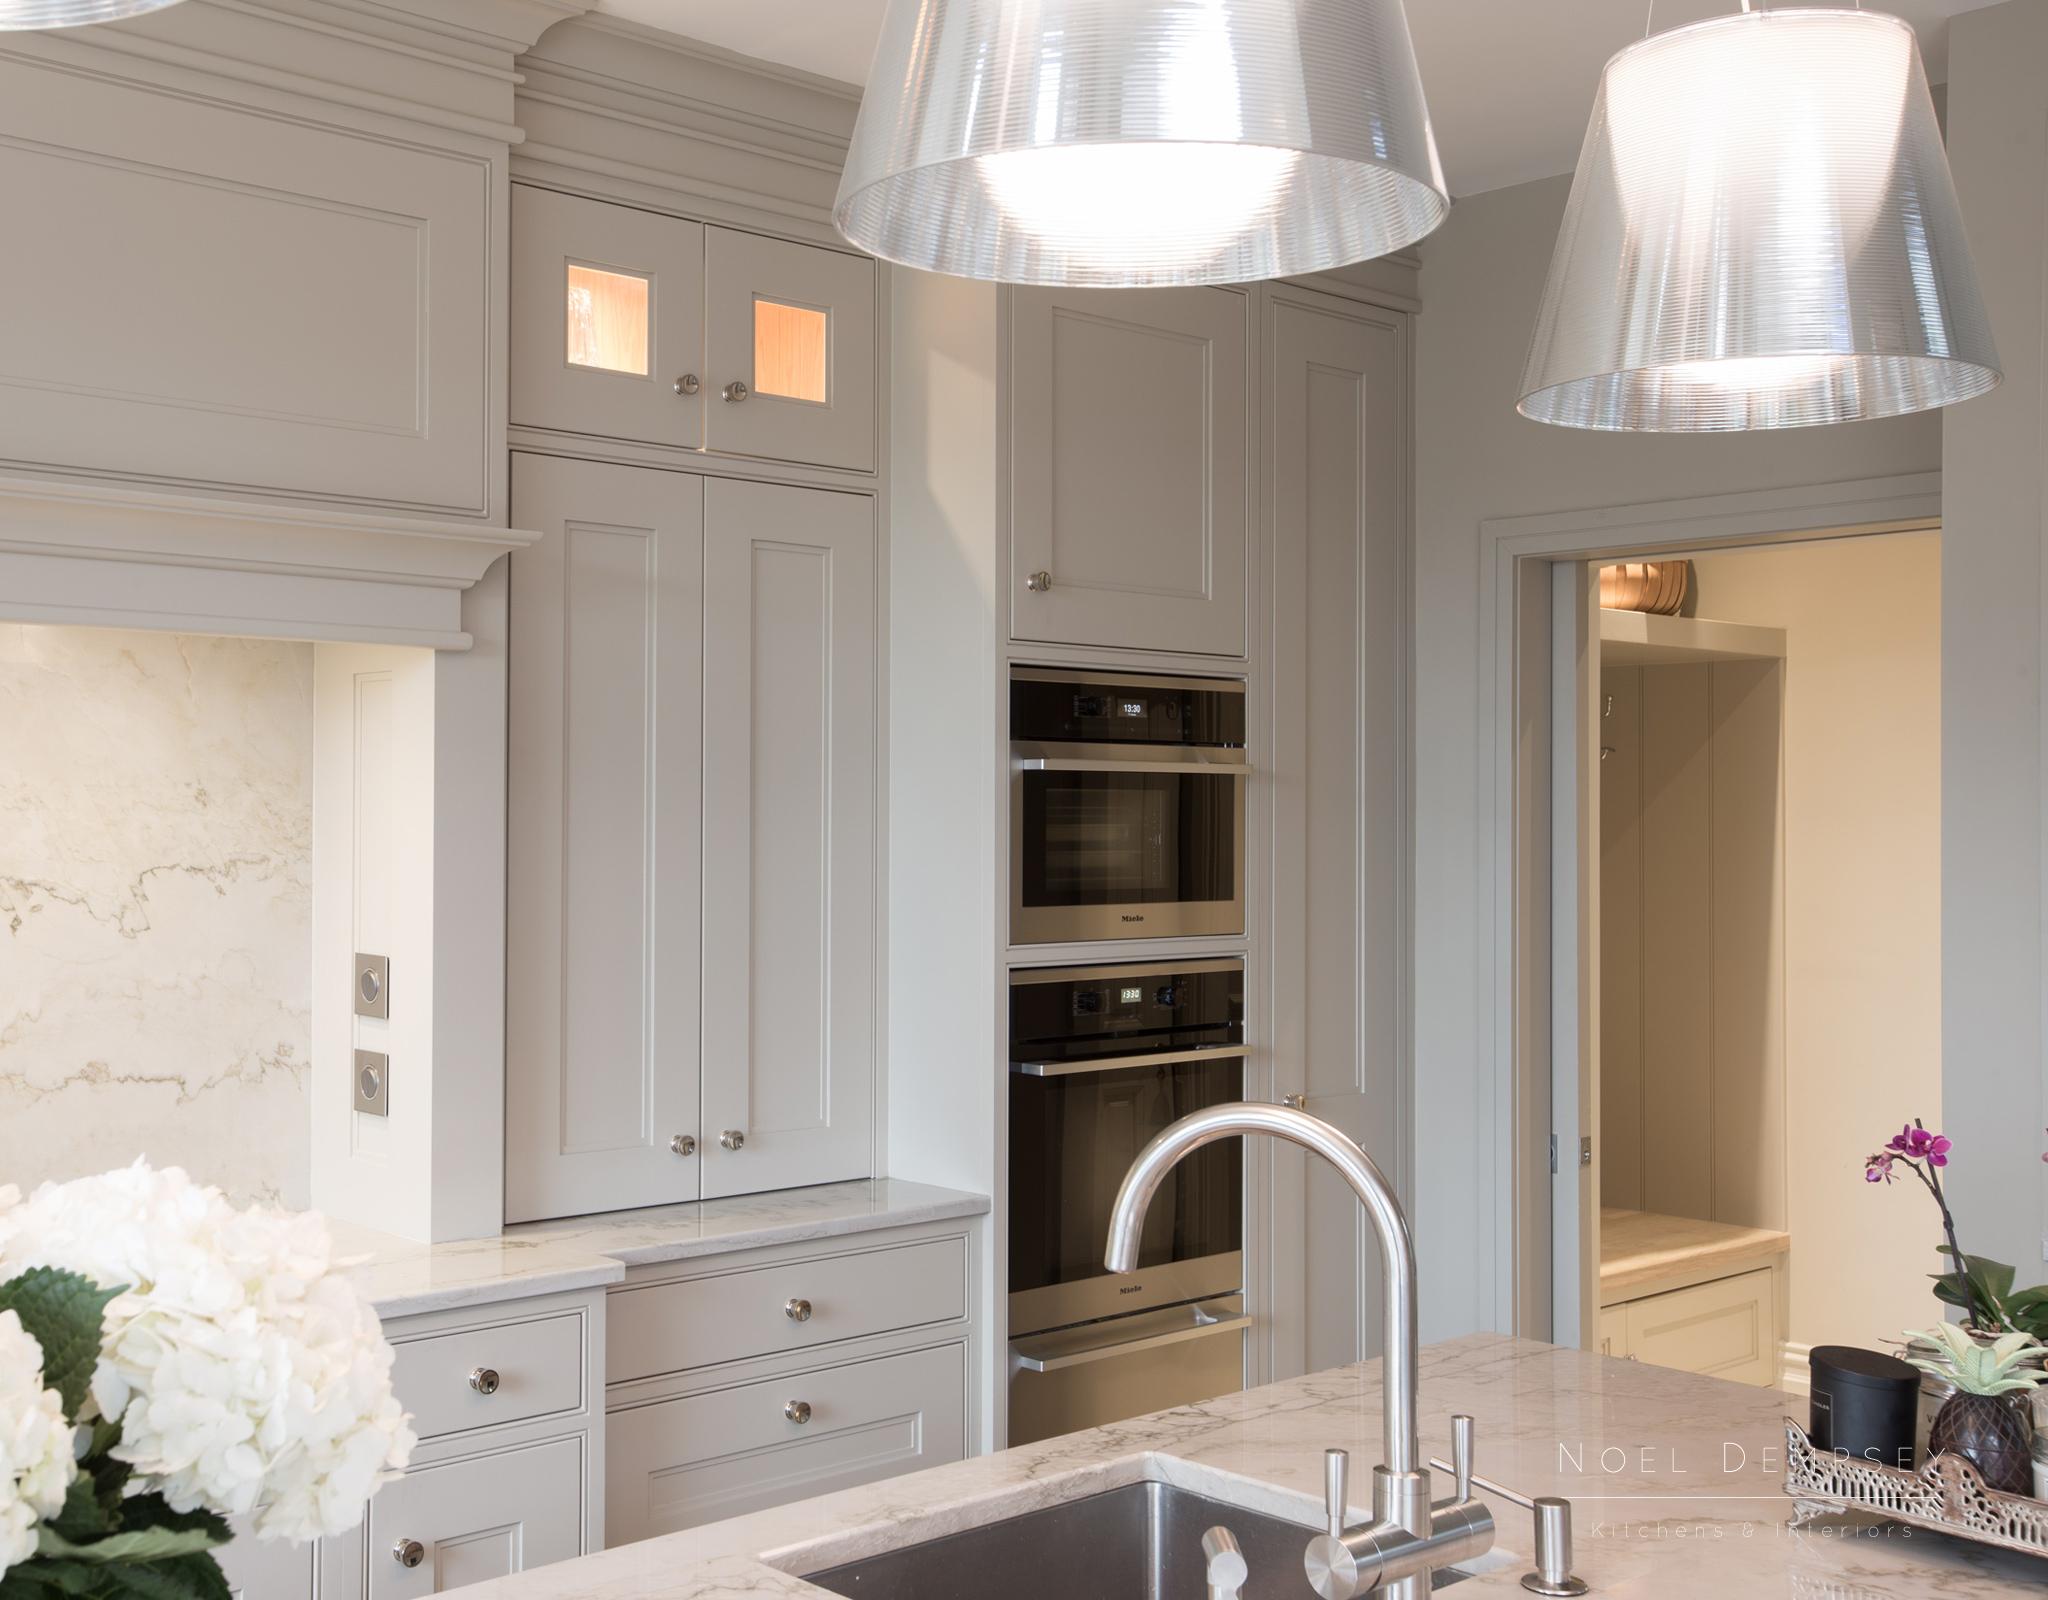 Dartry-Painted-Kitchens-4.jpg